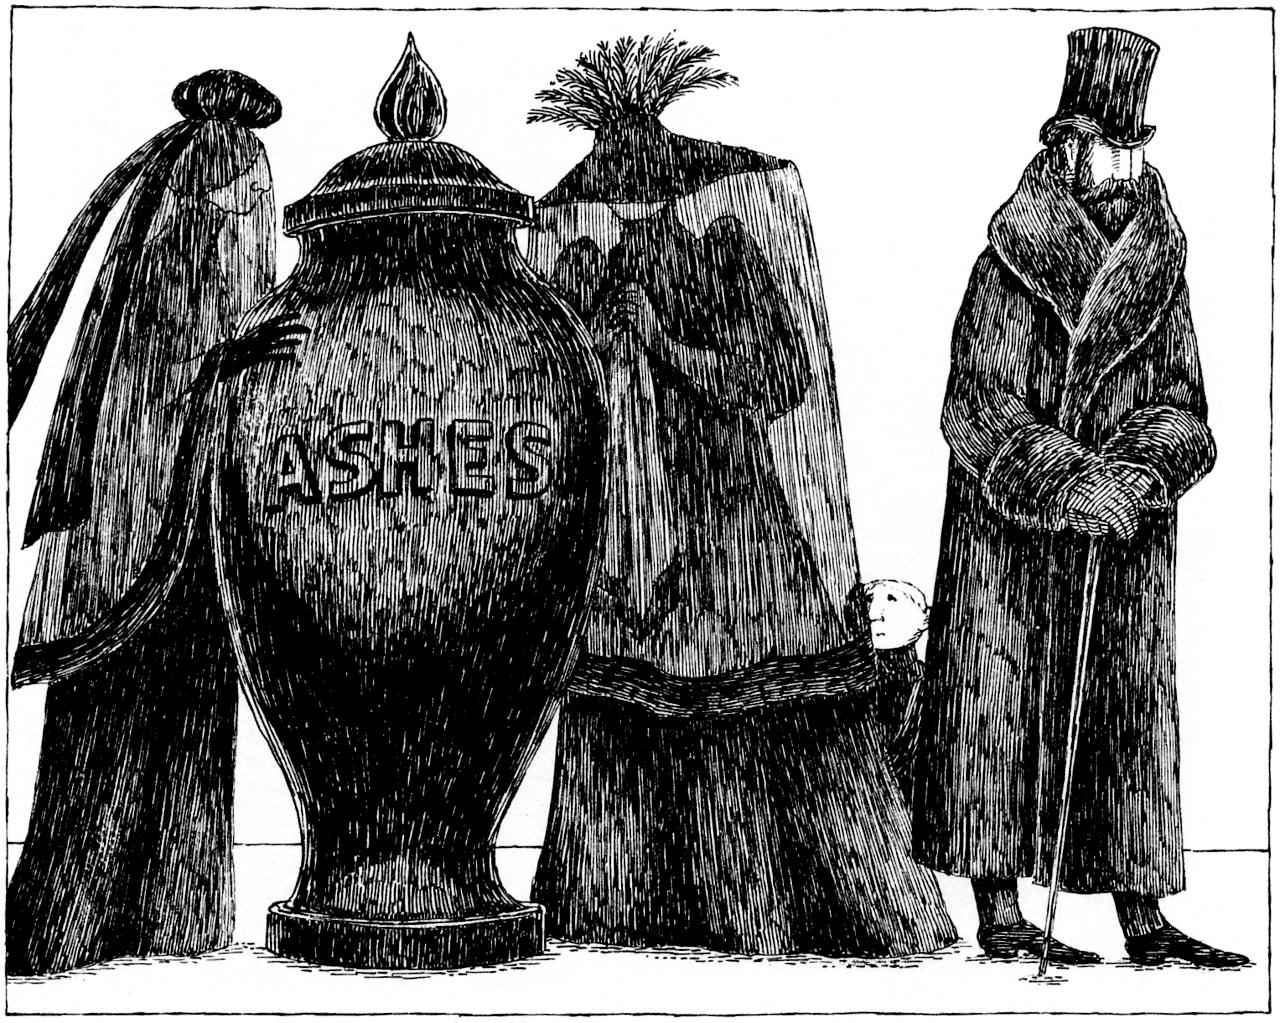 Ashes (Edward Gorey)